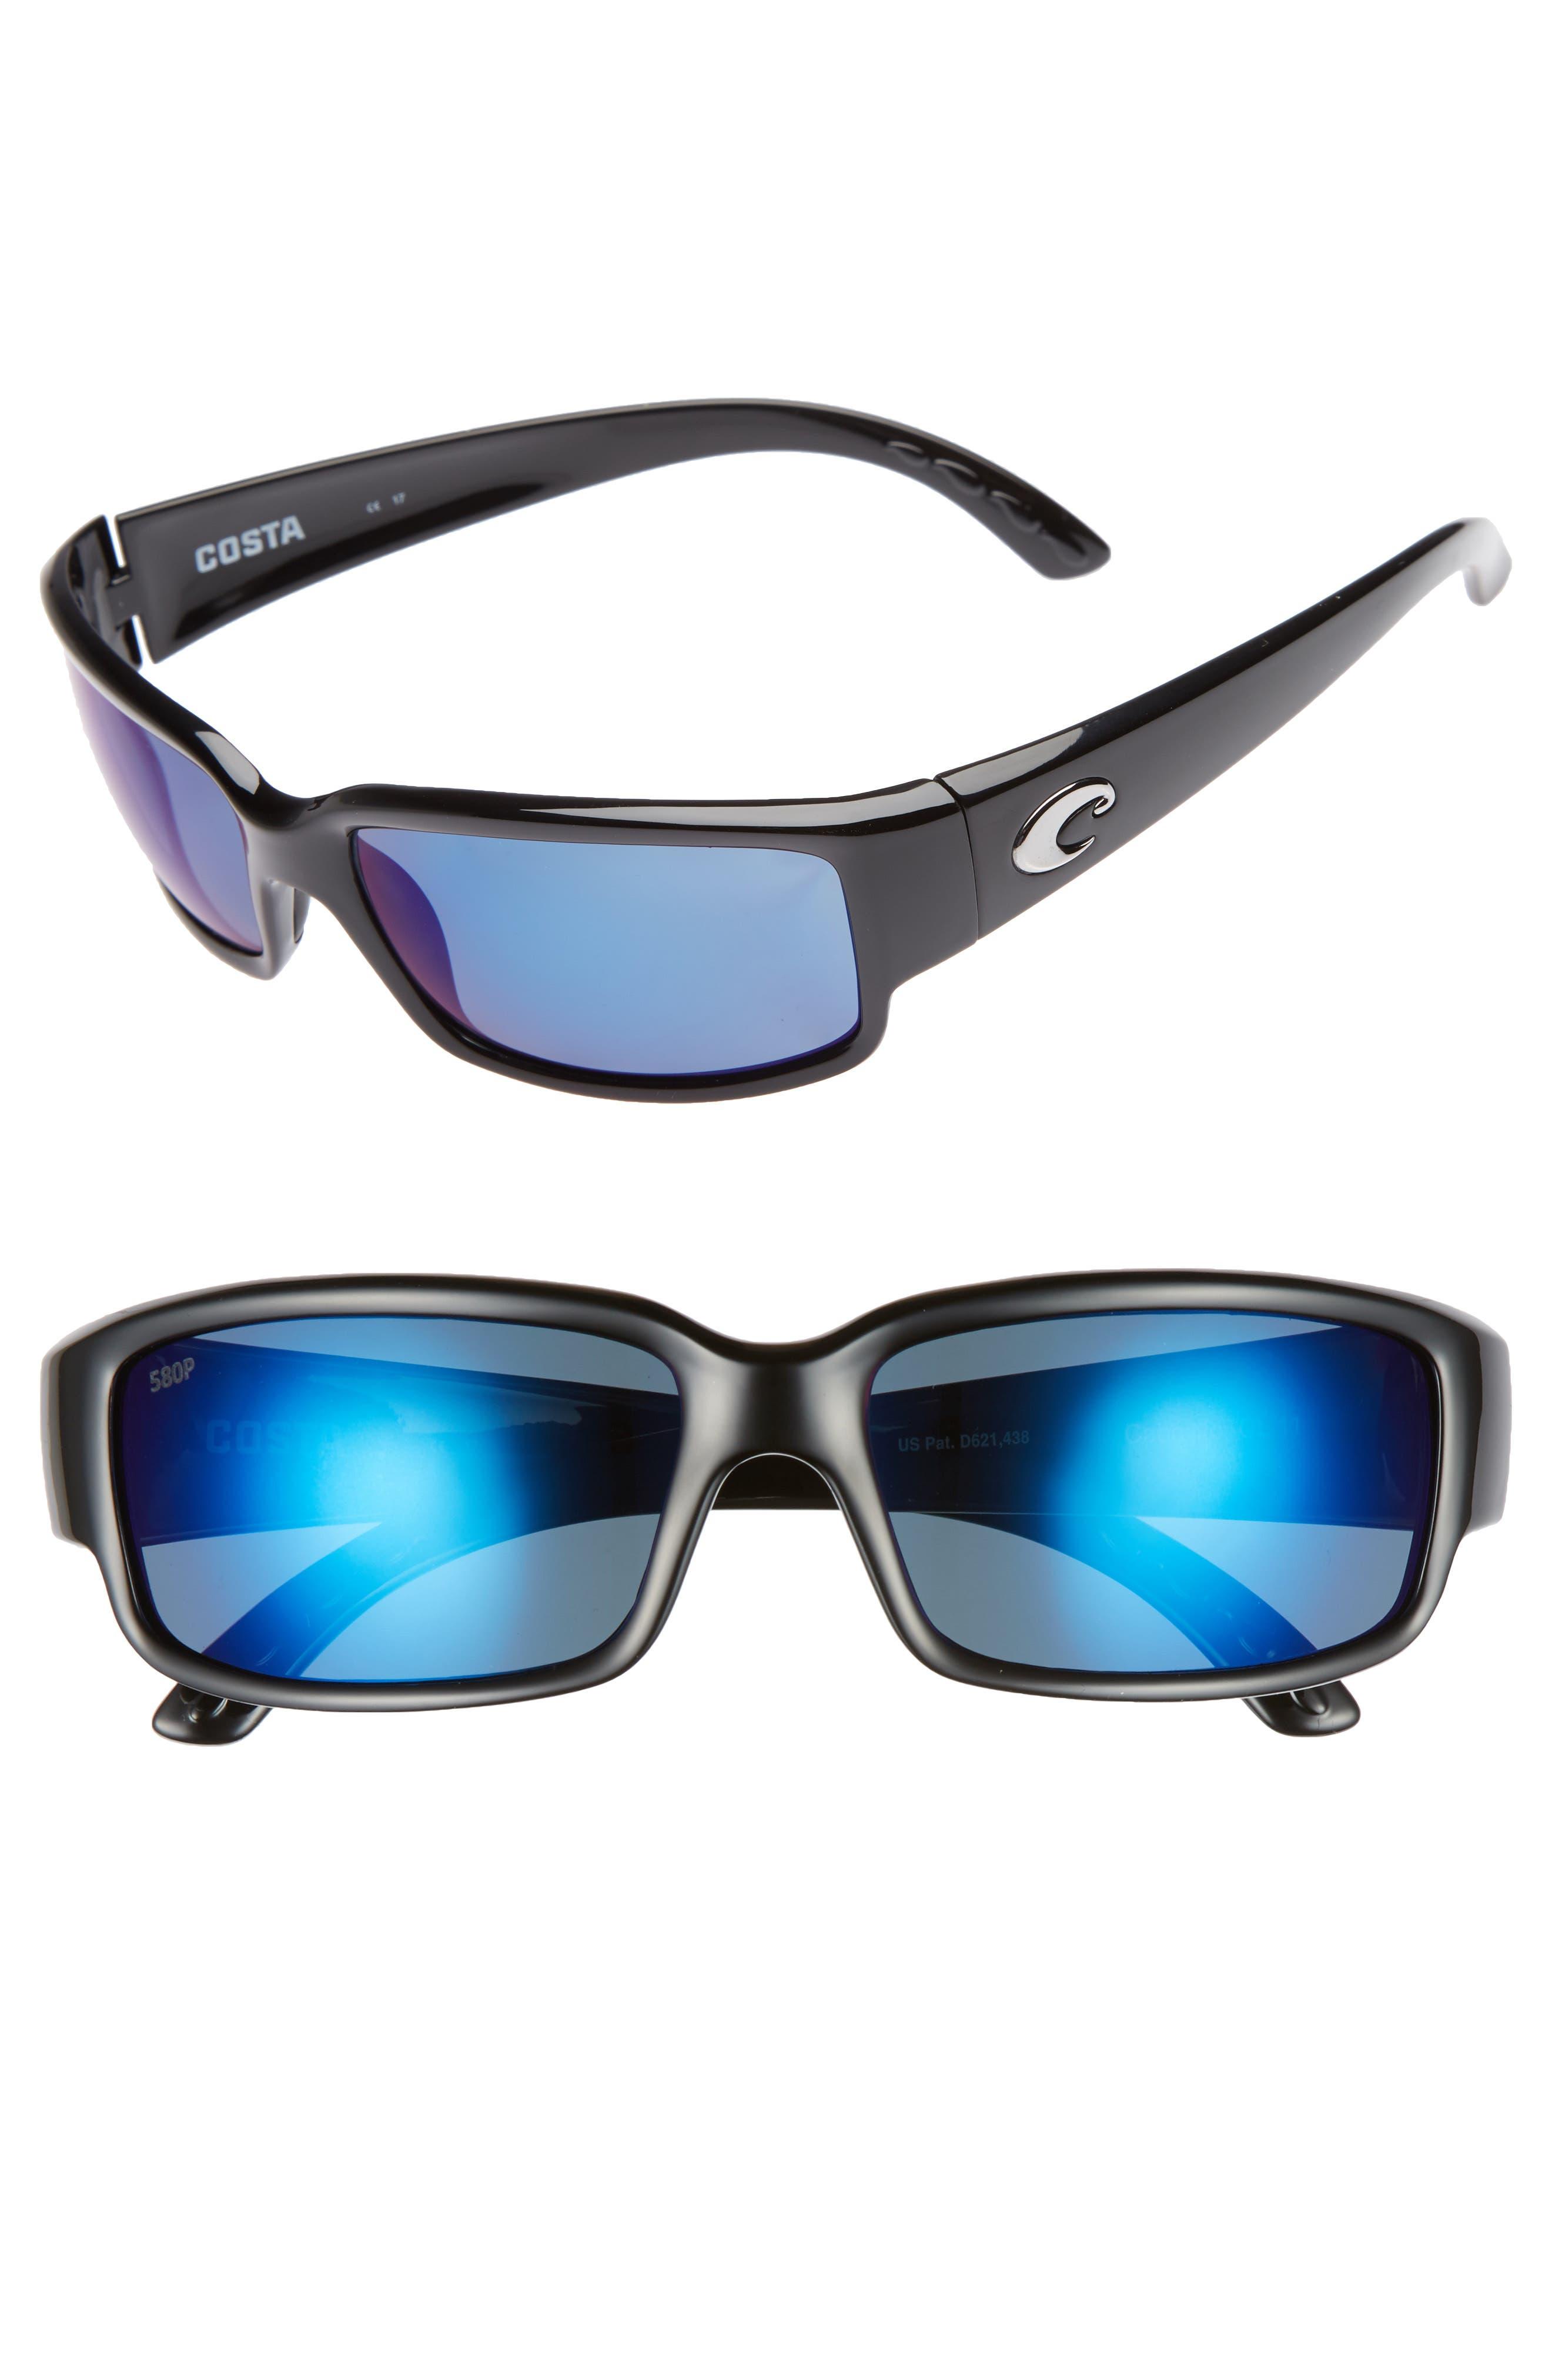 Caballito 60mm Polarized Sunglasses,                             Main thumbnail 1, color,                             BLACK/ BLUE MIRROR